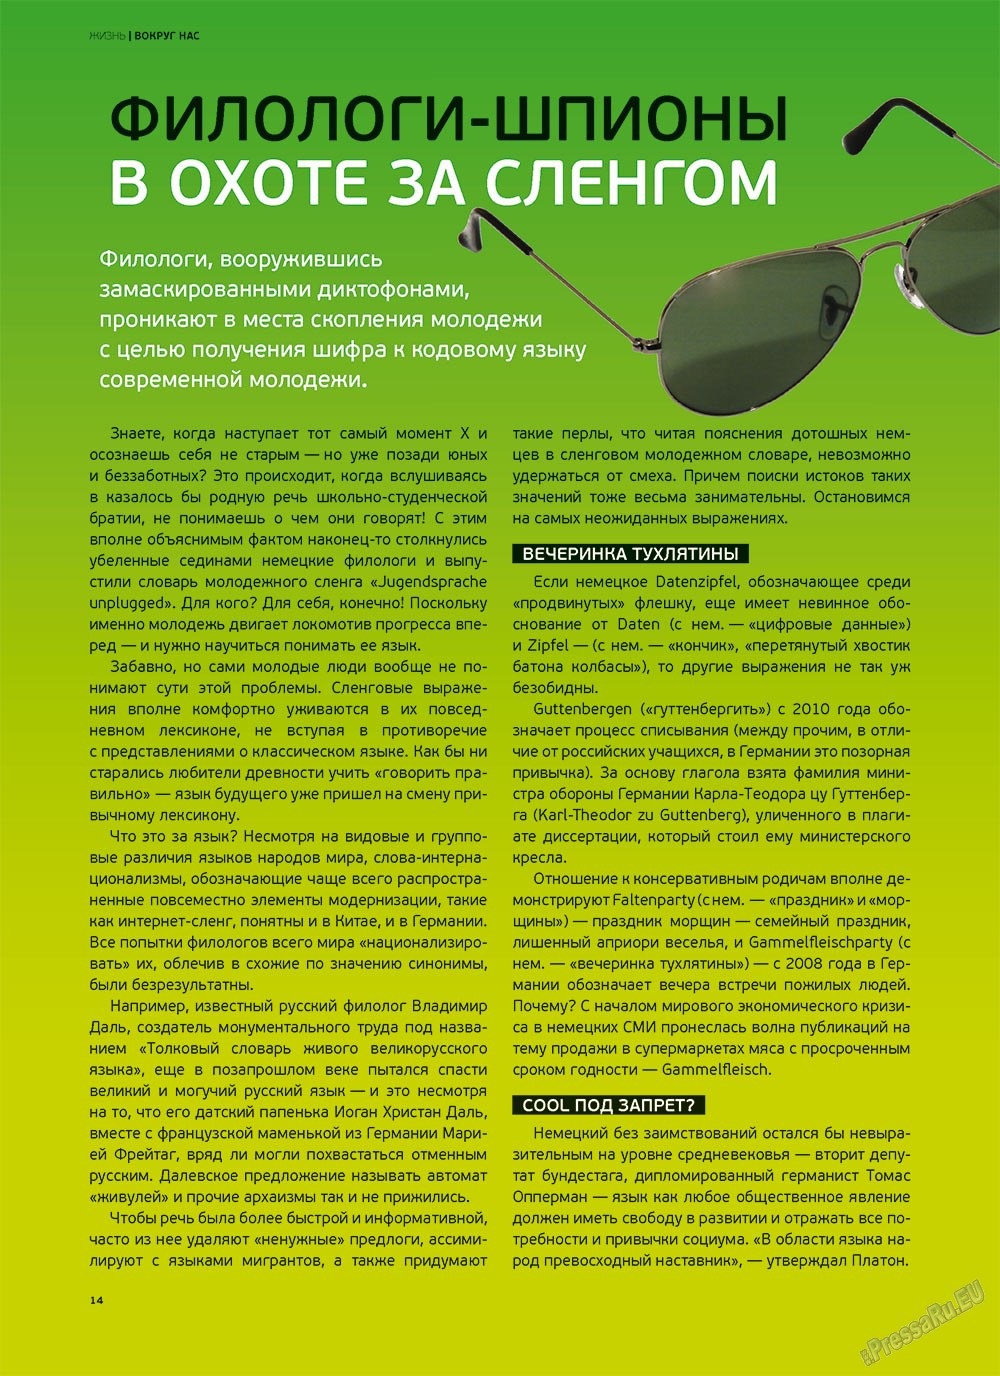 Артек (журнал). 2011 год, номер 6, стр. 16